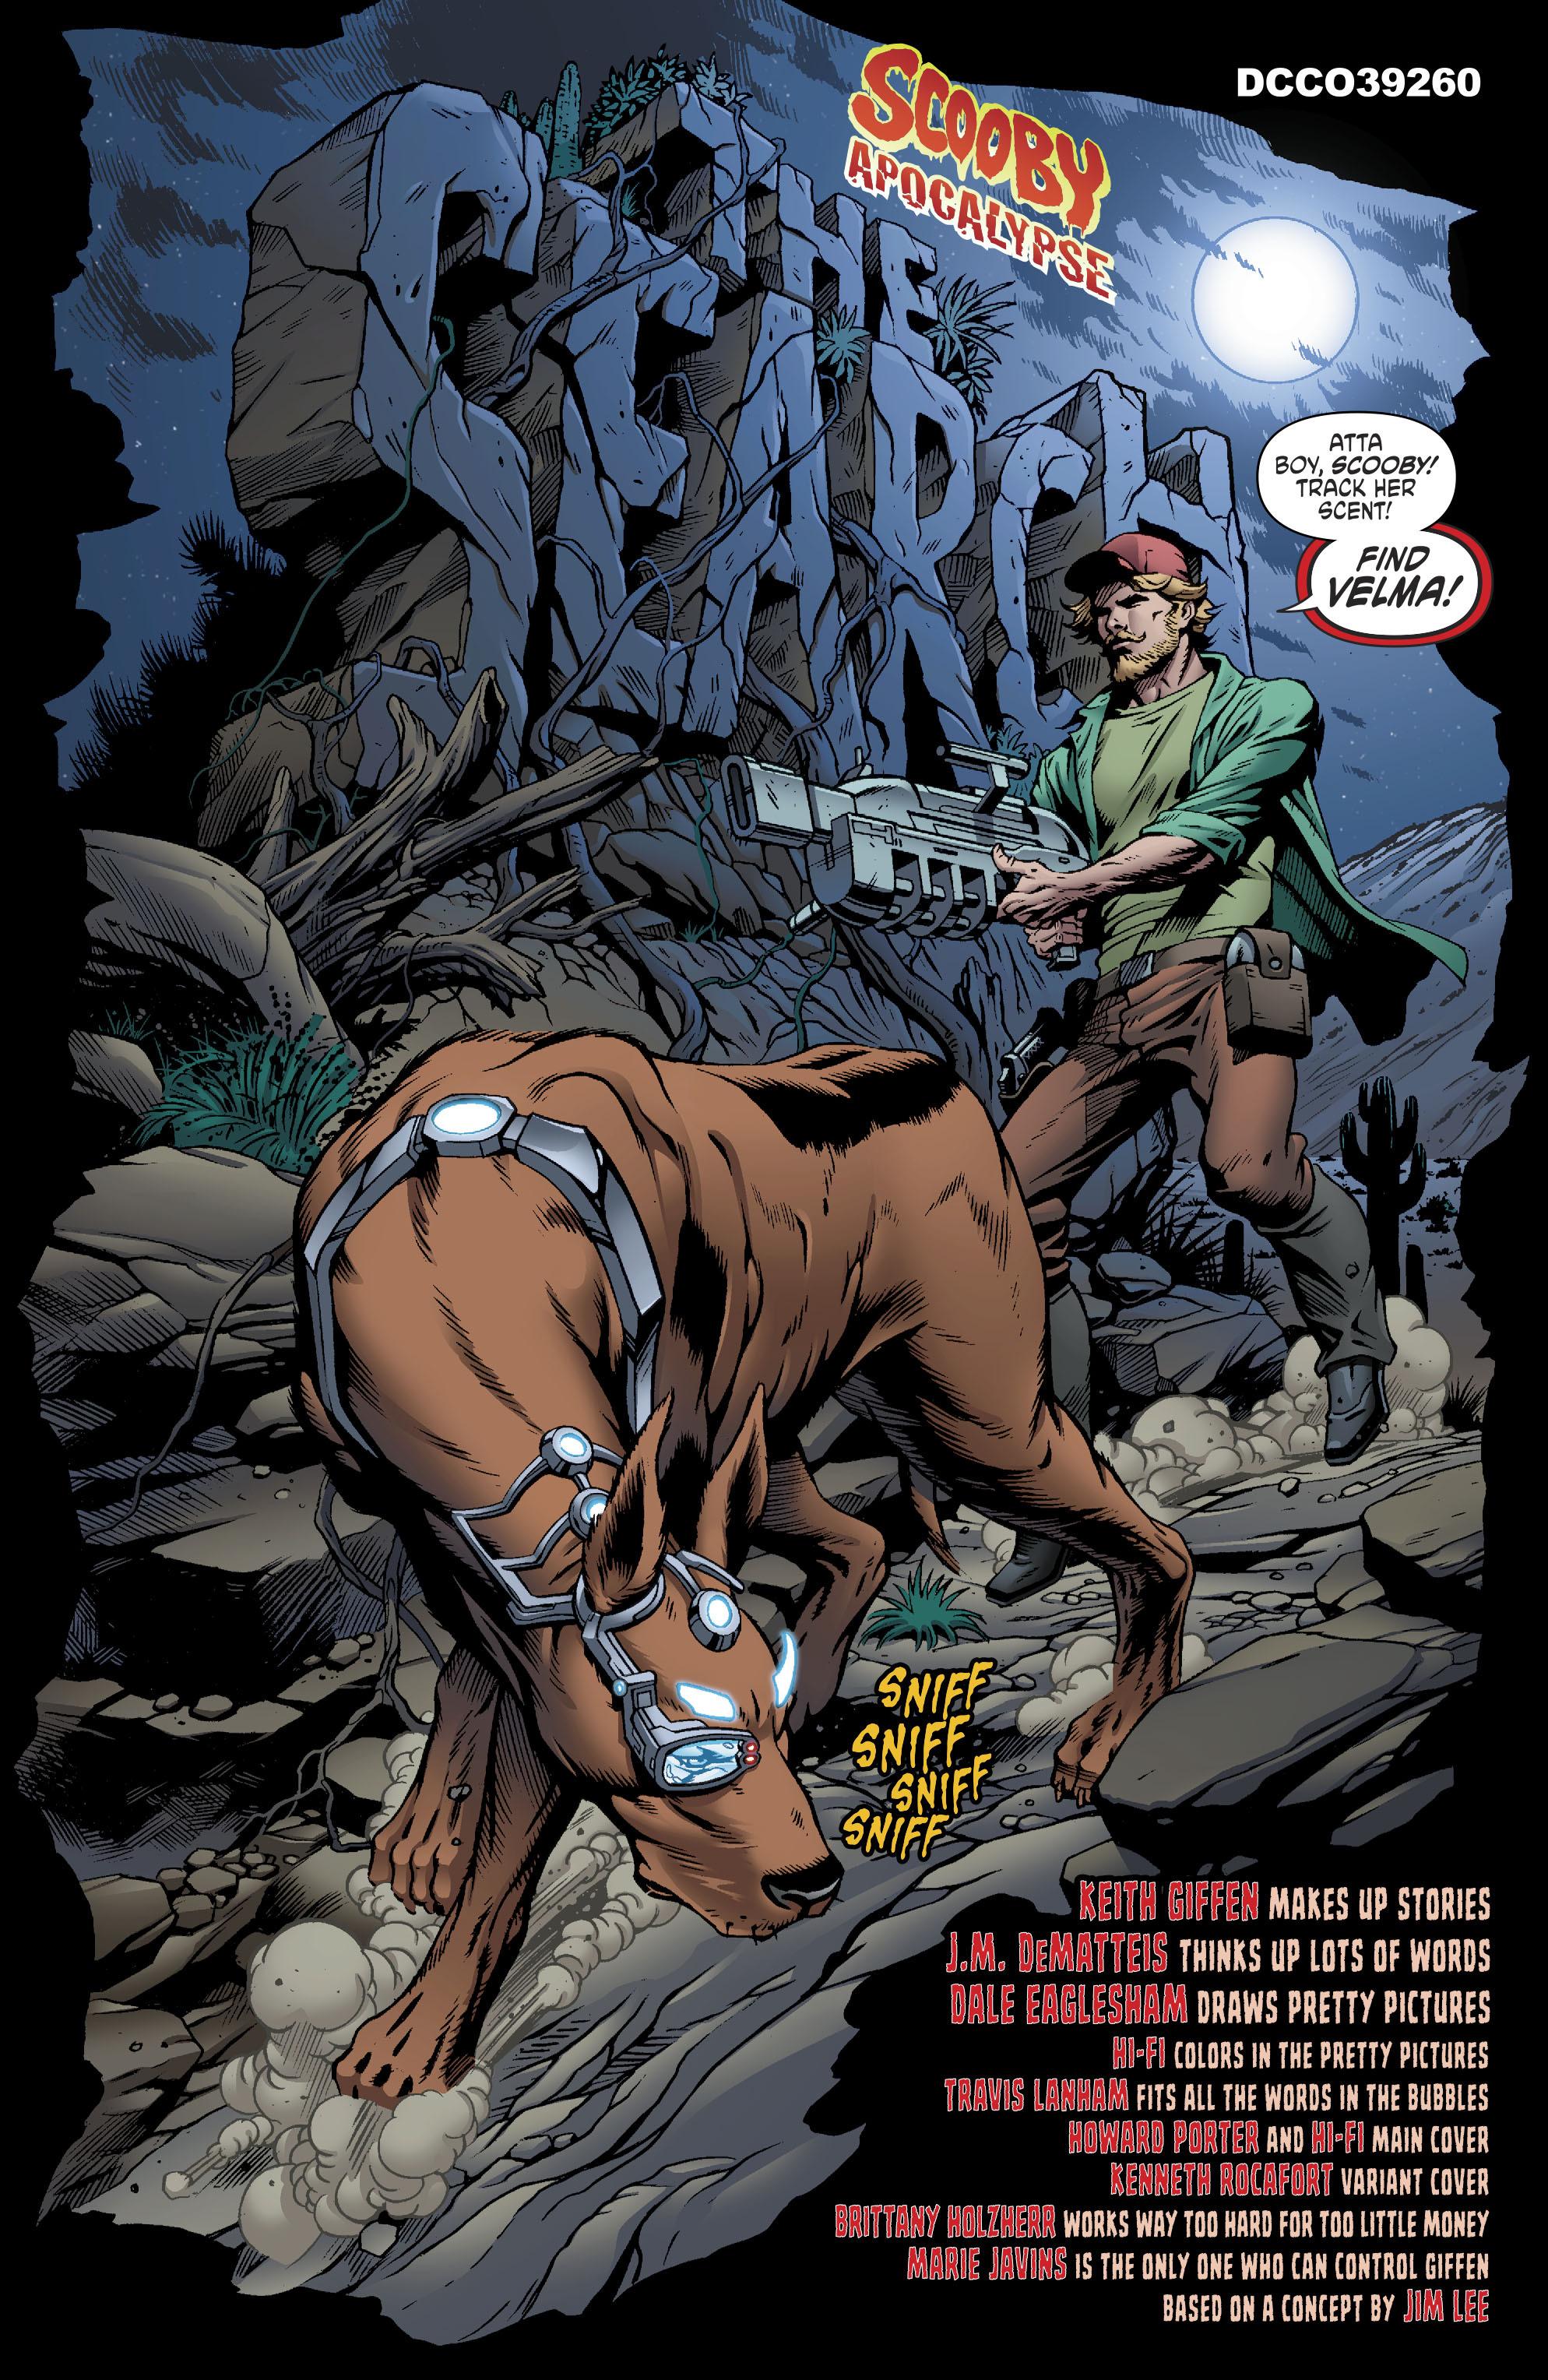 Read online Scooby Apocalypse comic -  Issue #11 - 4